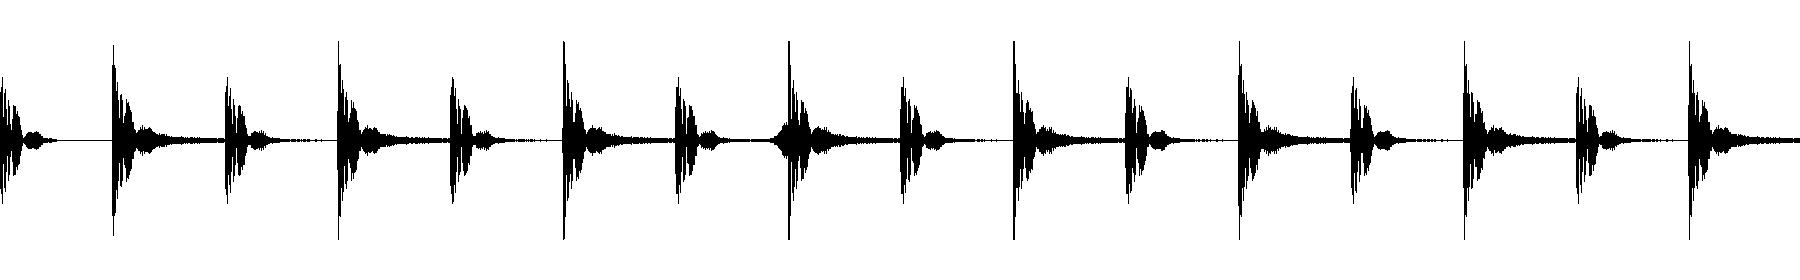 104 drums 03 sp